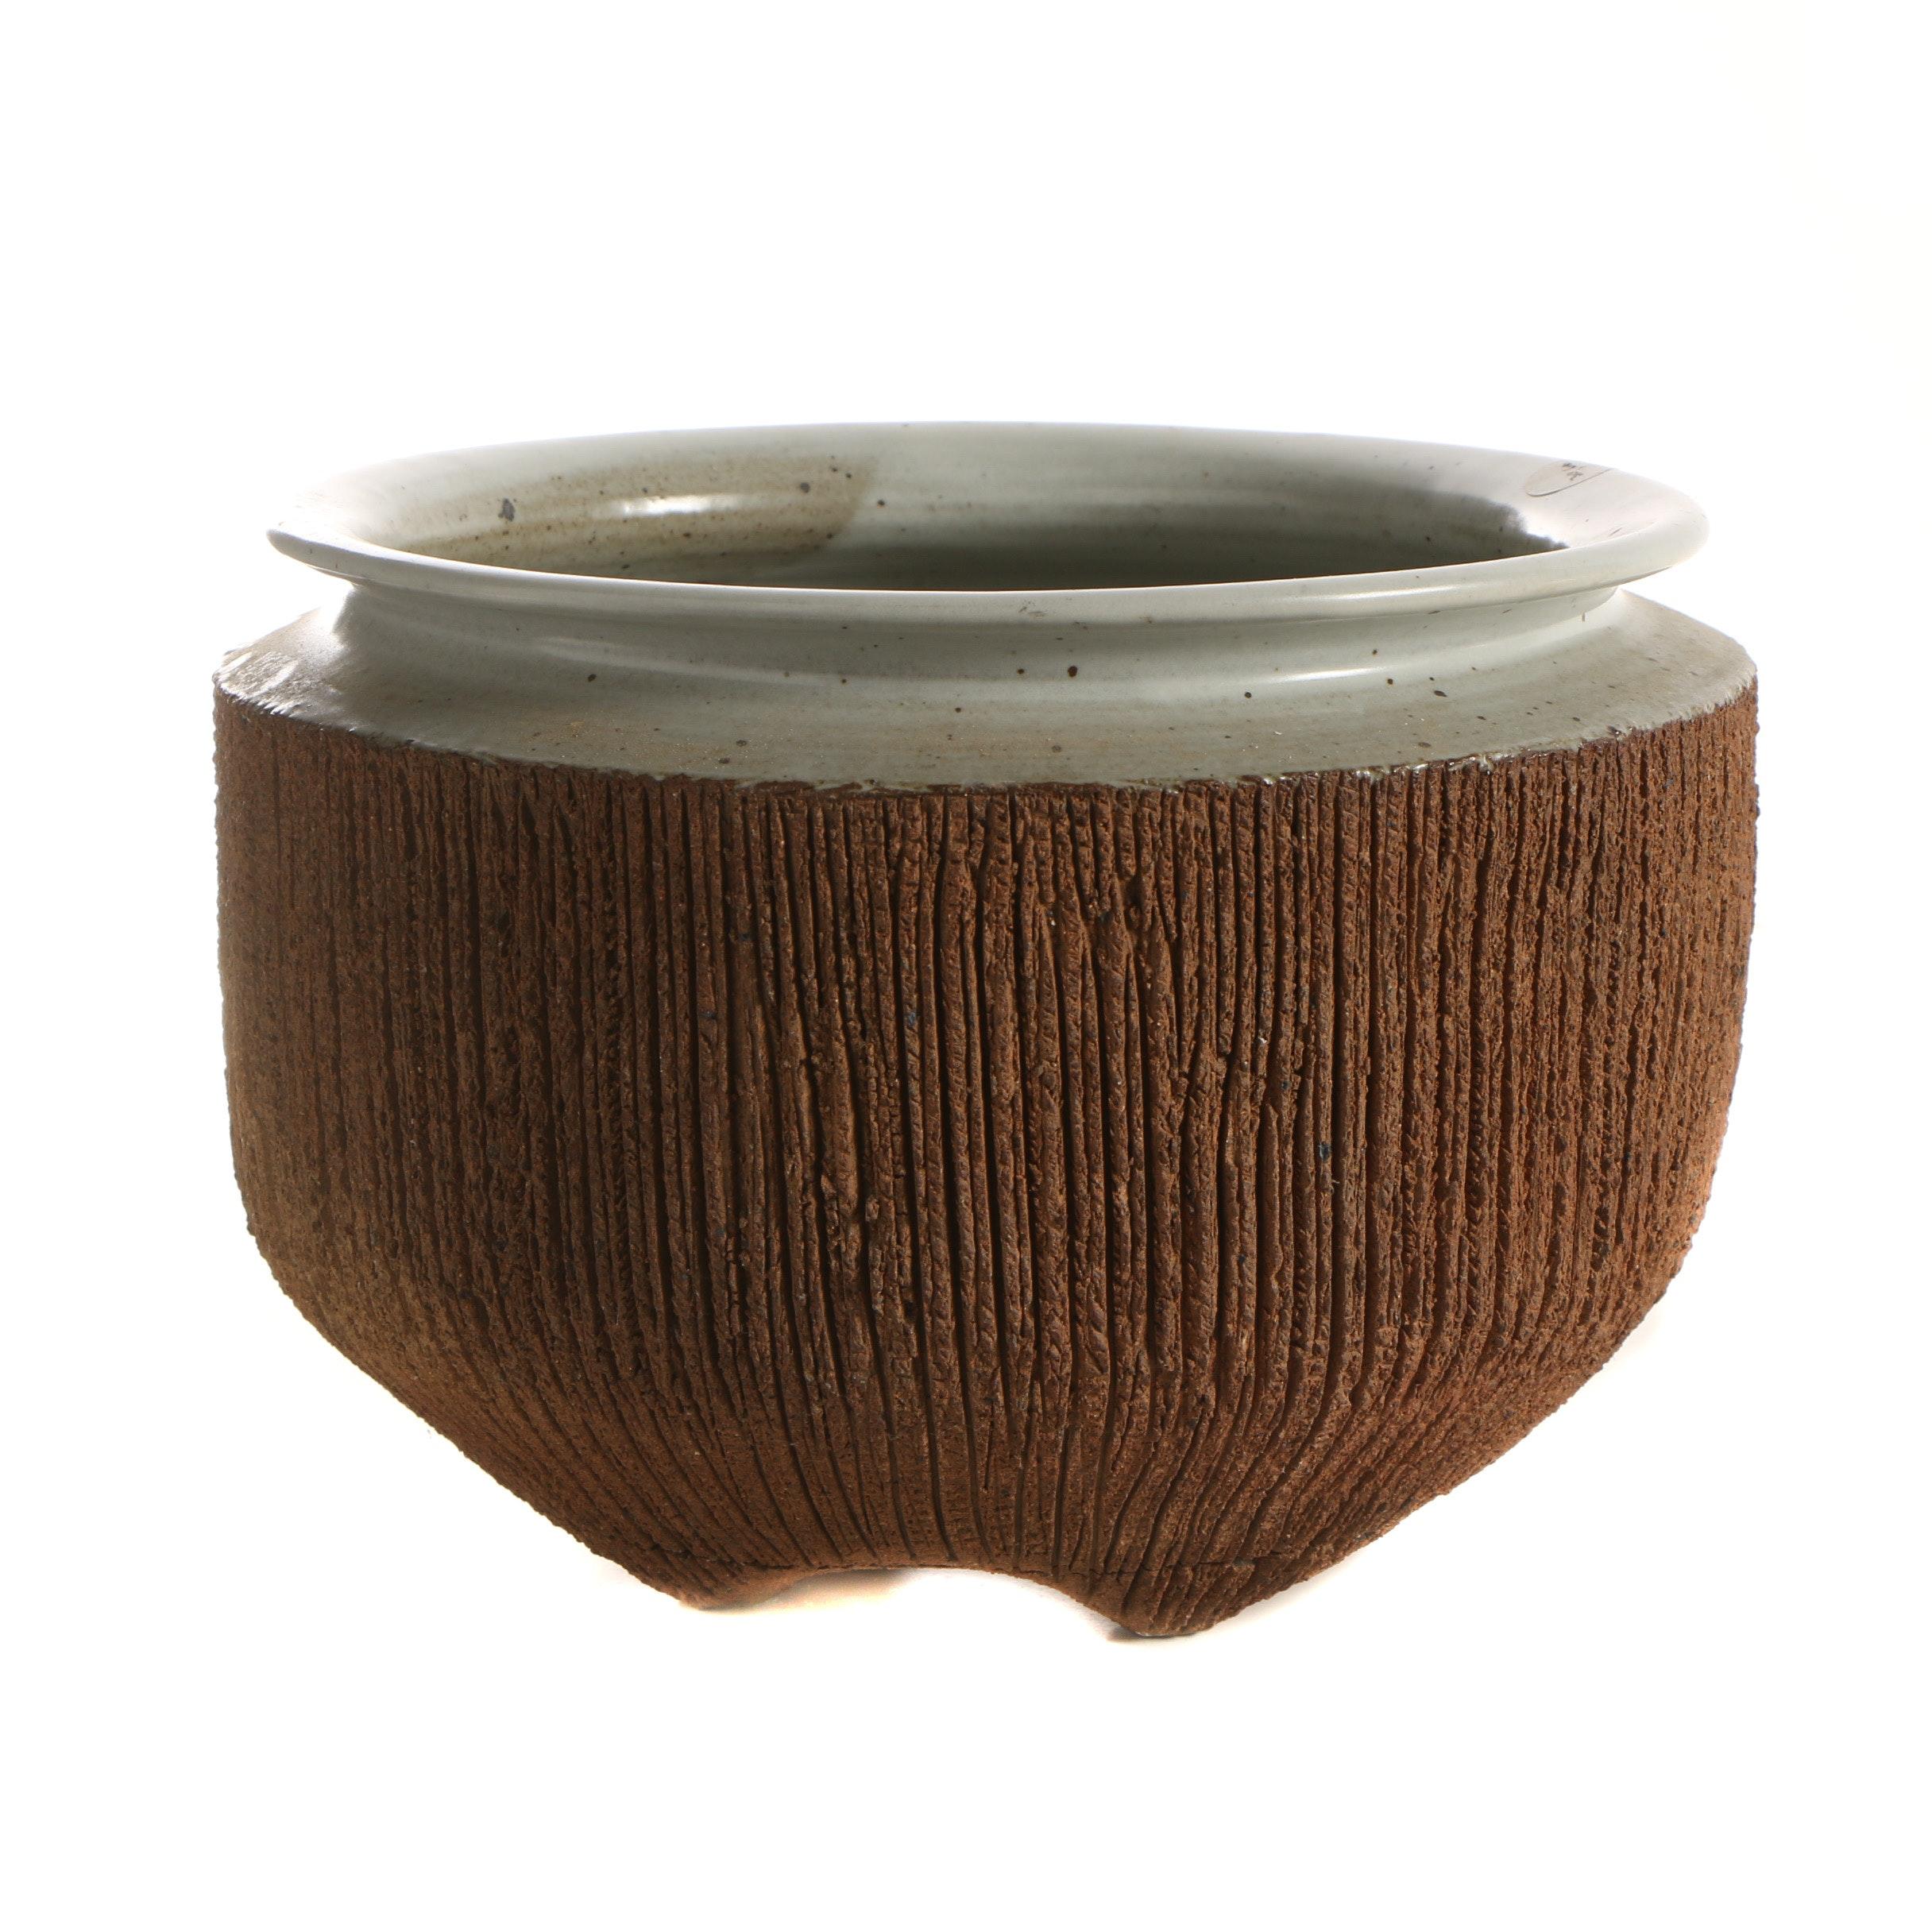 John Tuska Stoneware Vessel